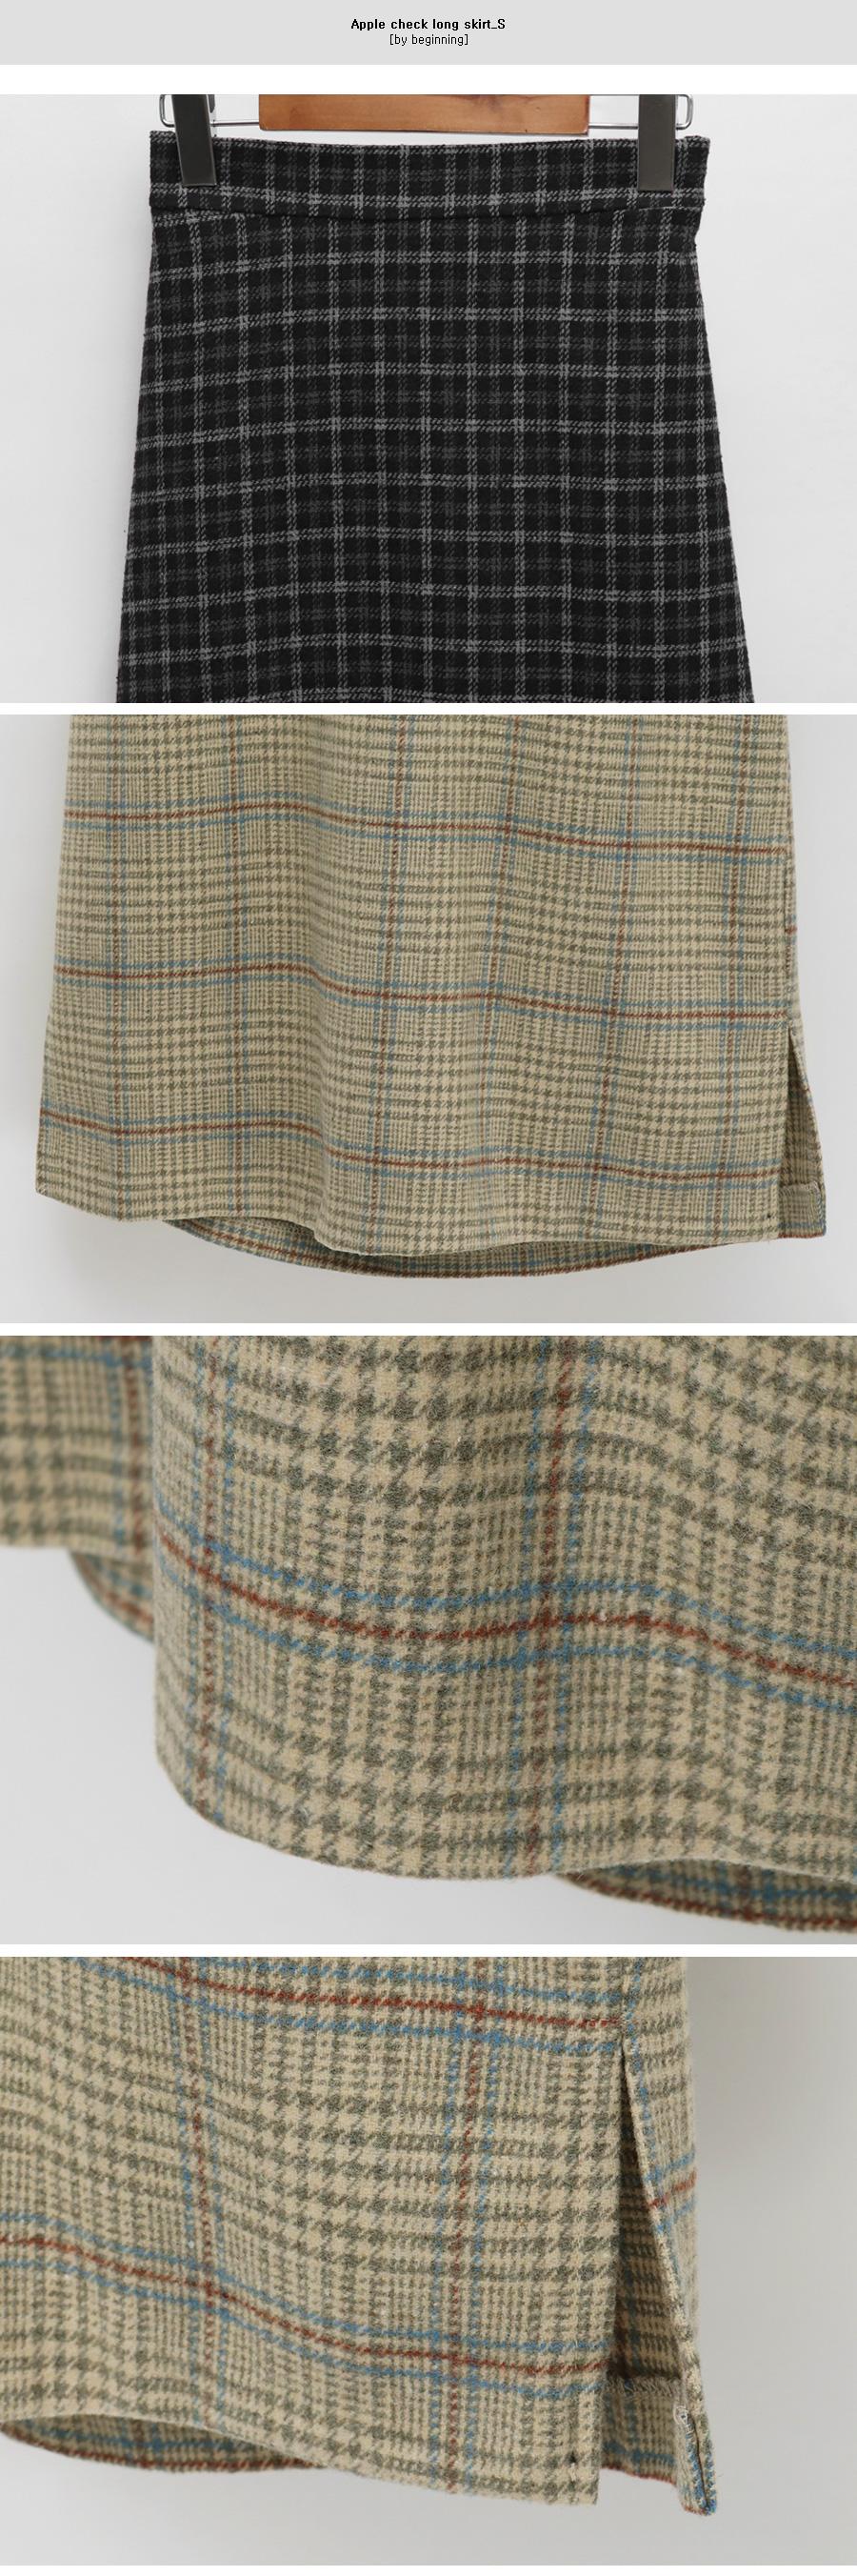 Apple check long skirt_S (size : free)